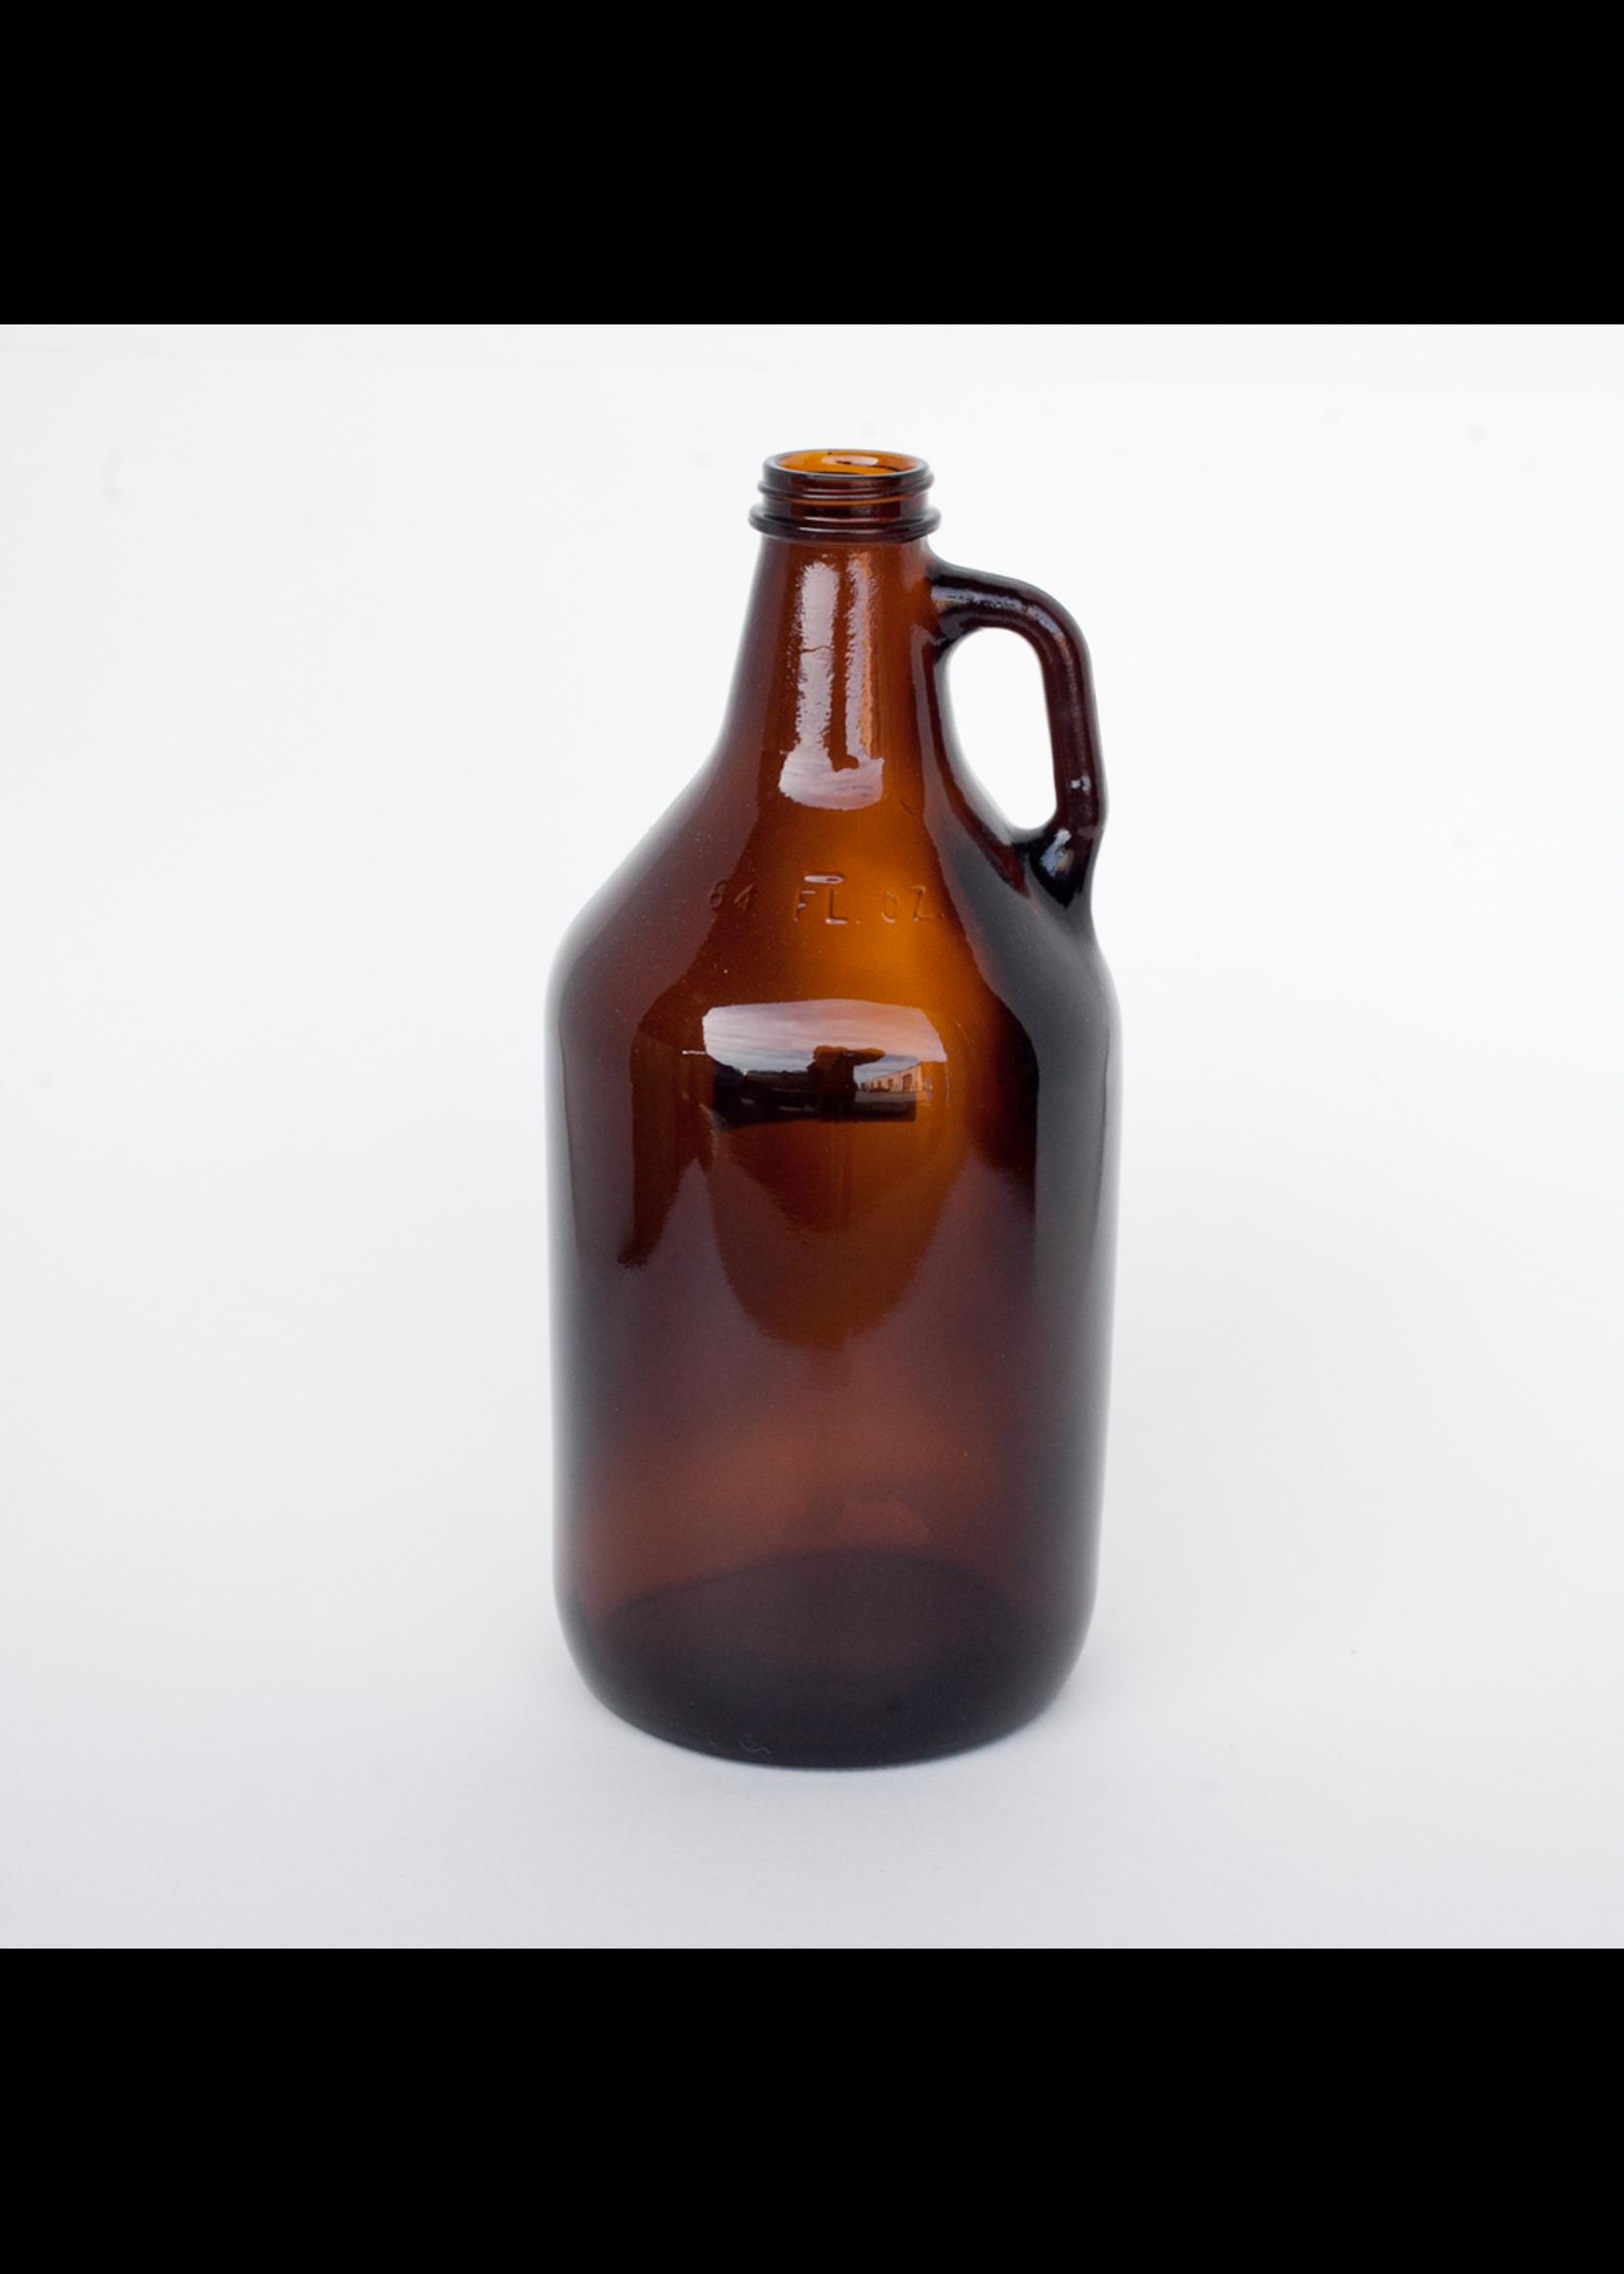 Racking/Bottling Glass Jug - Amber 1/2 Gallon Growler (1/each)